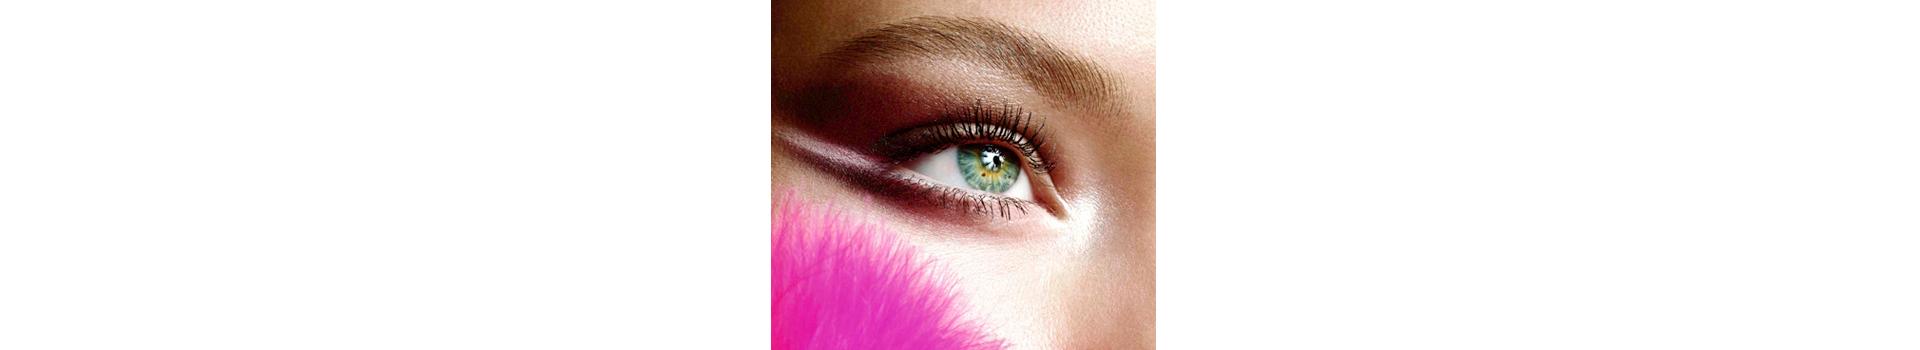 slider-makeup-artist